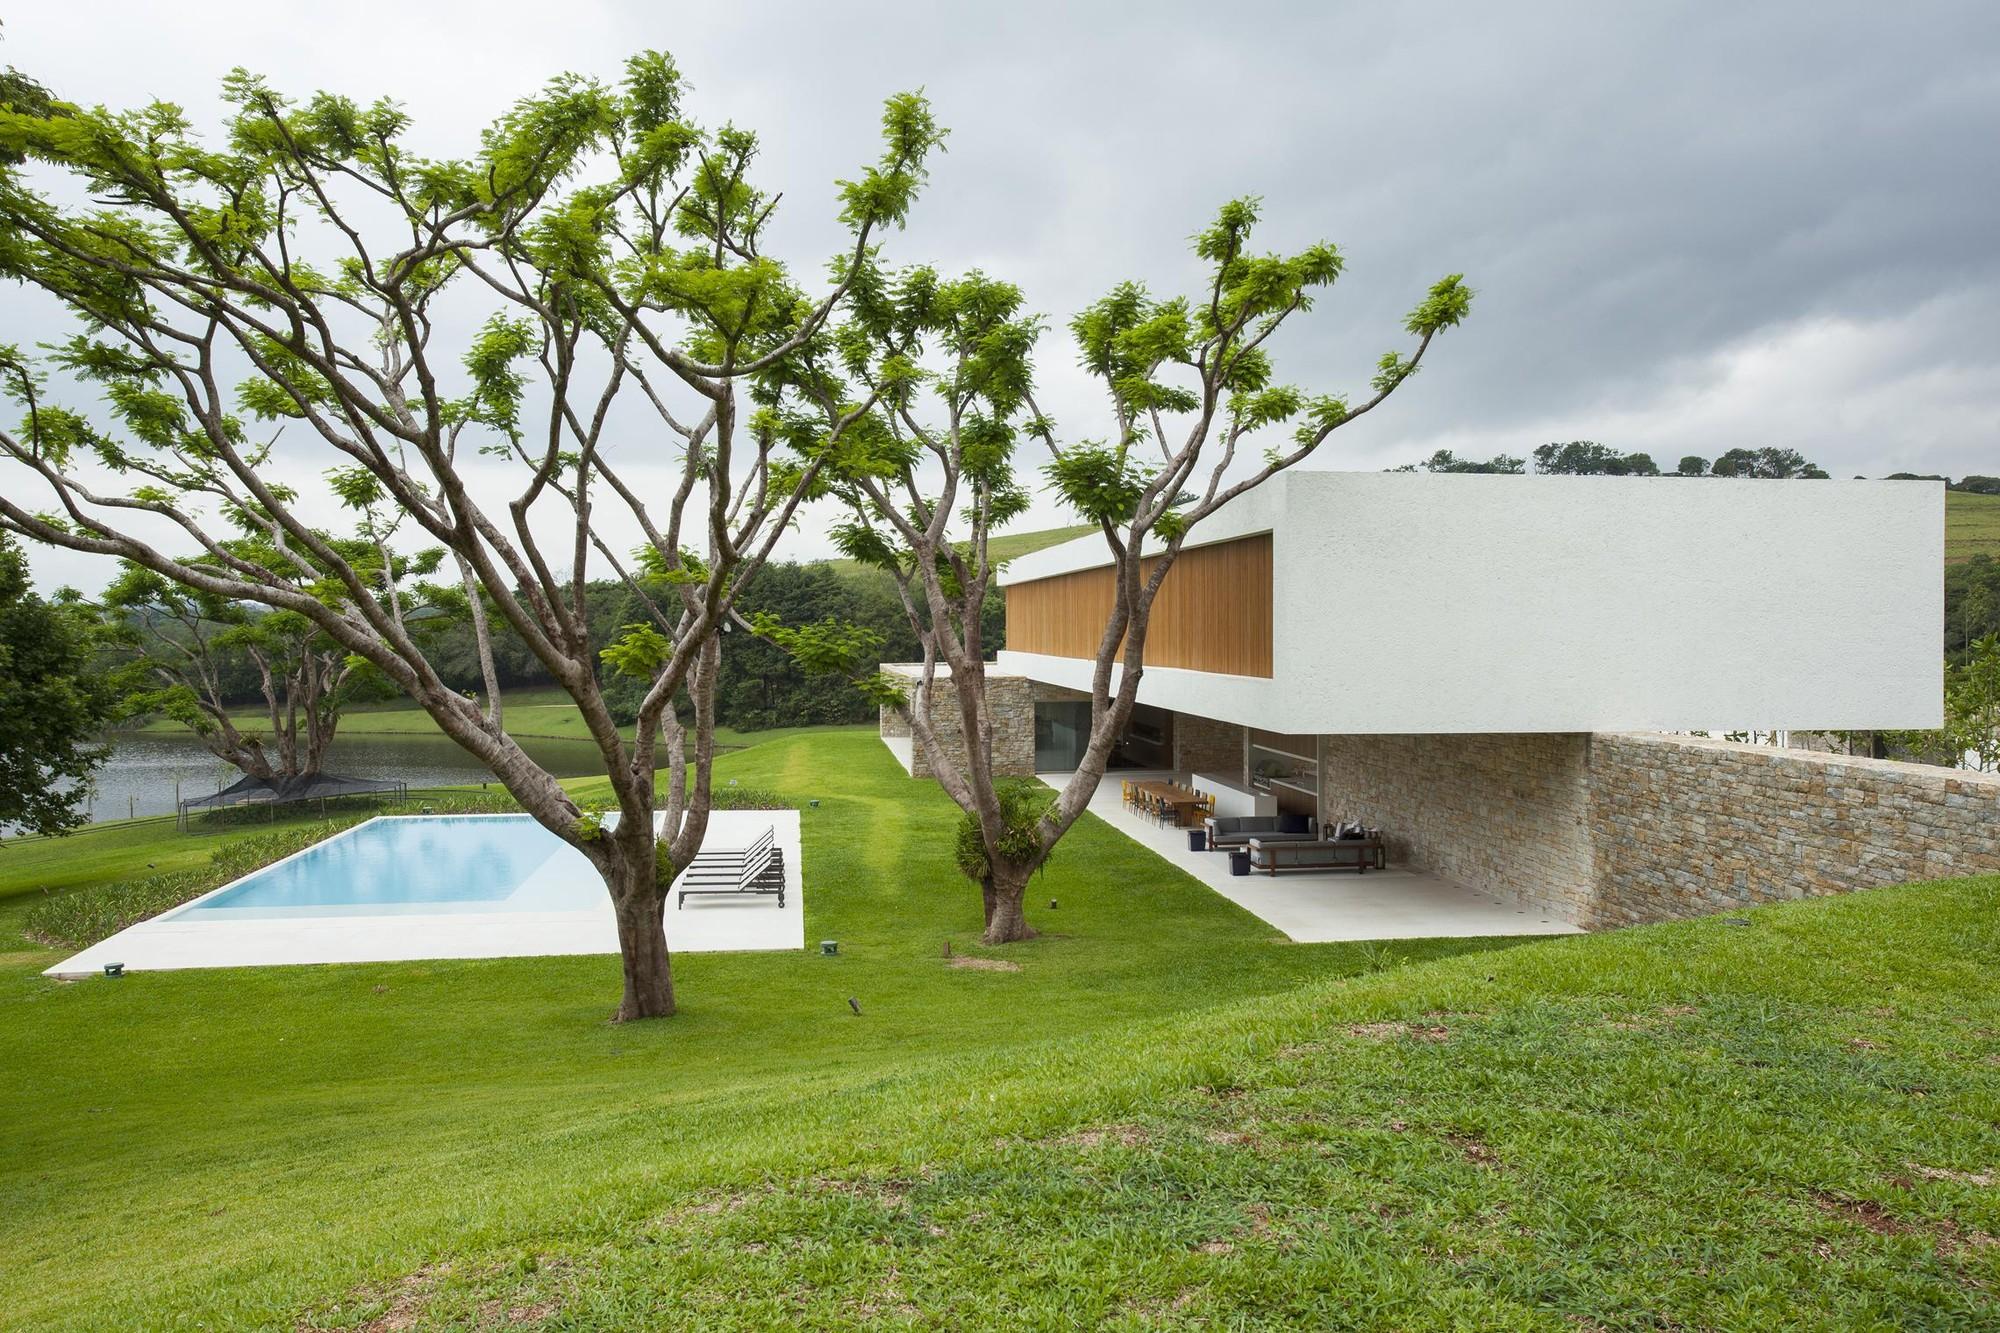 Itatiba Residence / RoccoVidal P+W, © Tuca Reinés